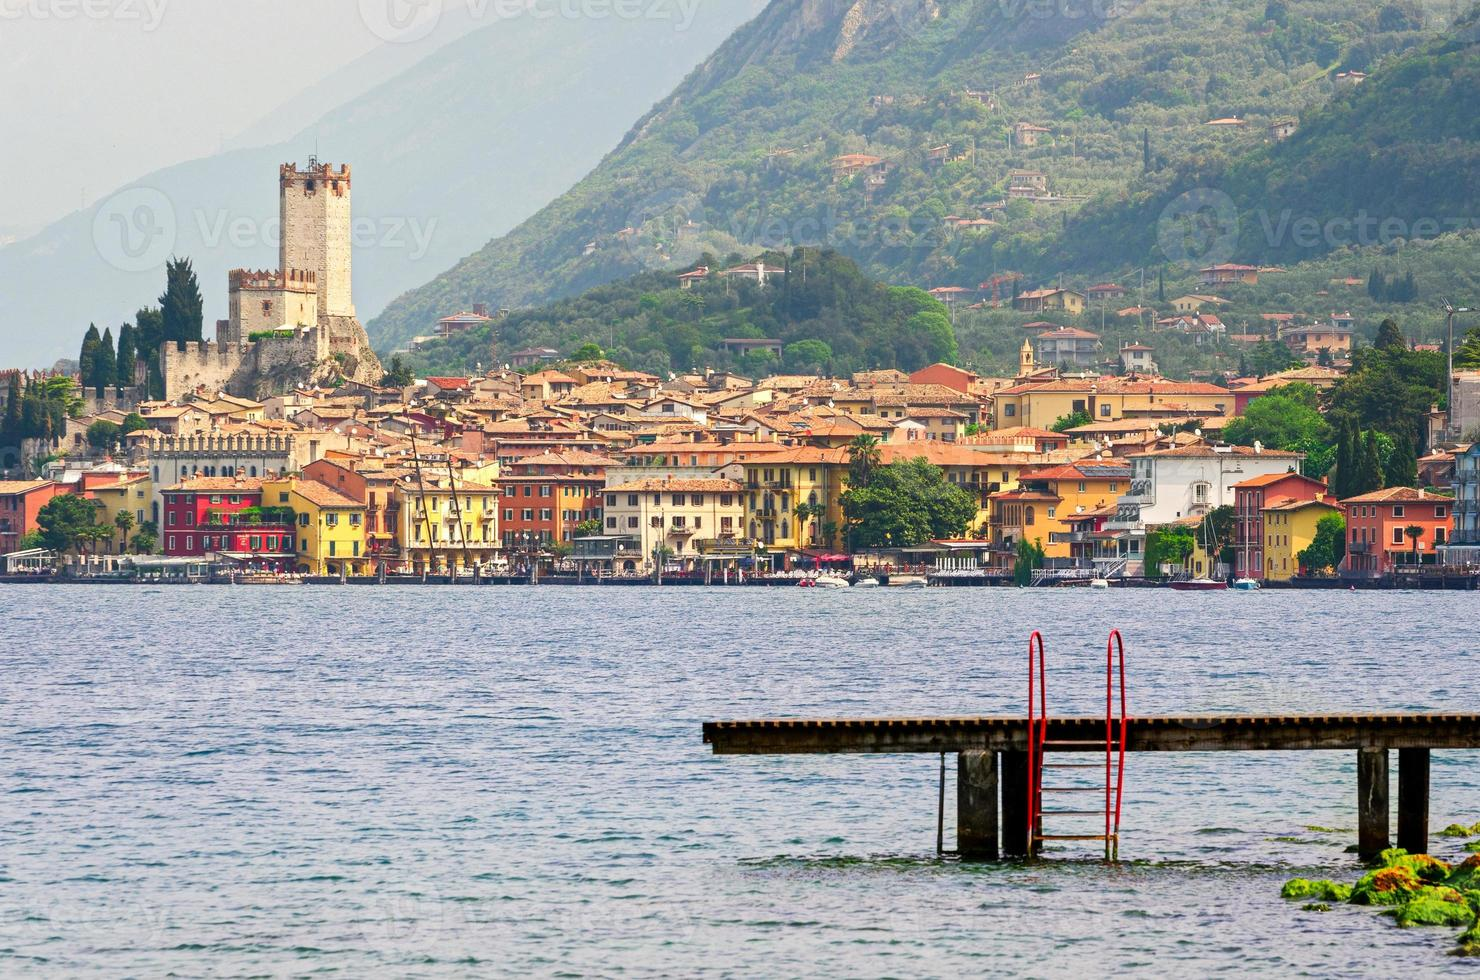 Lake Garda, Town of Malcesine (Veneto, Italy) photo